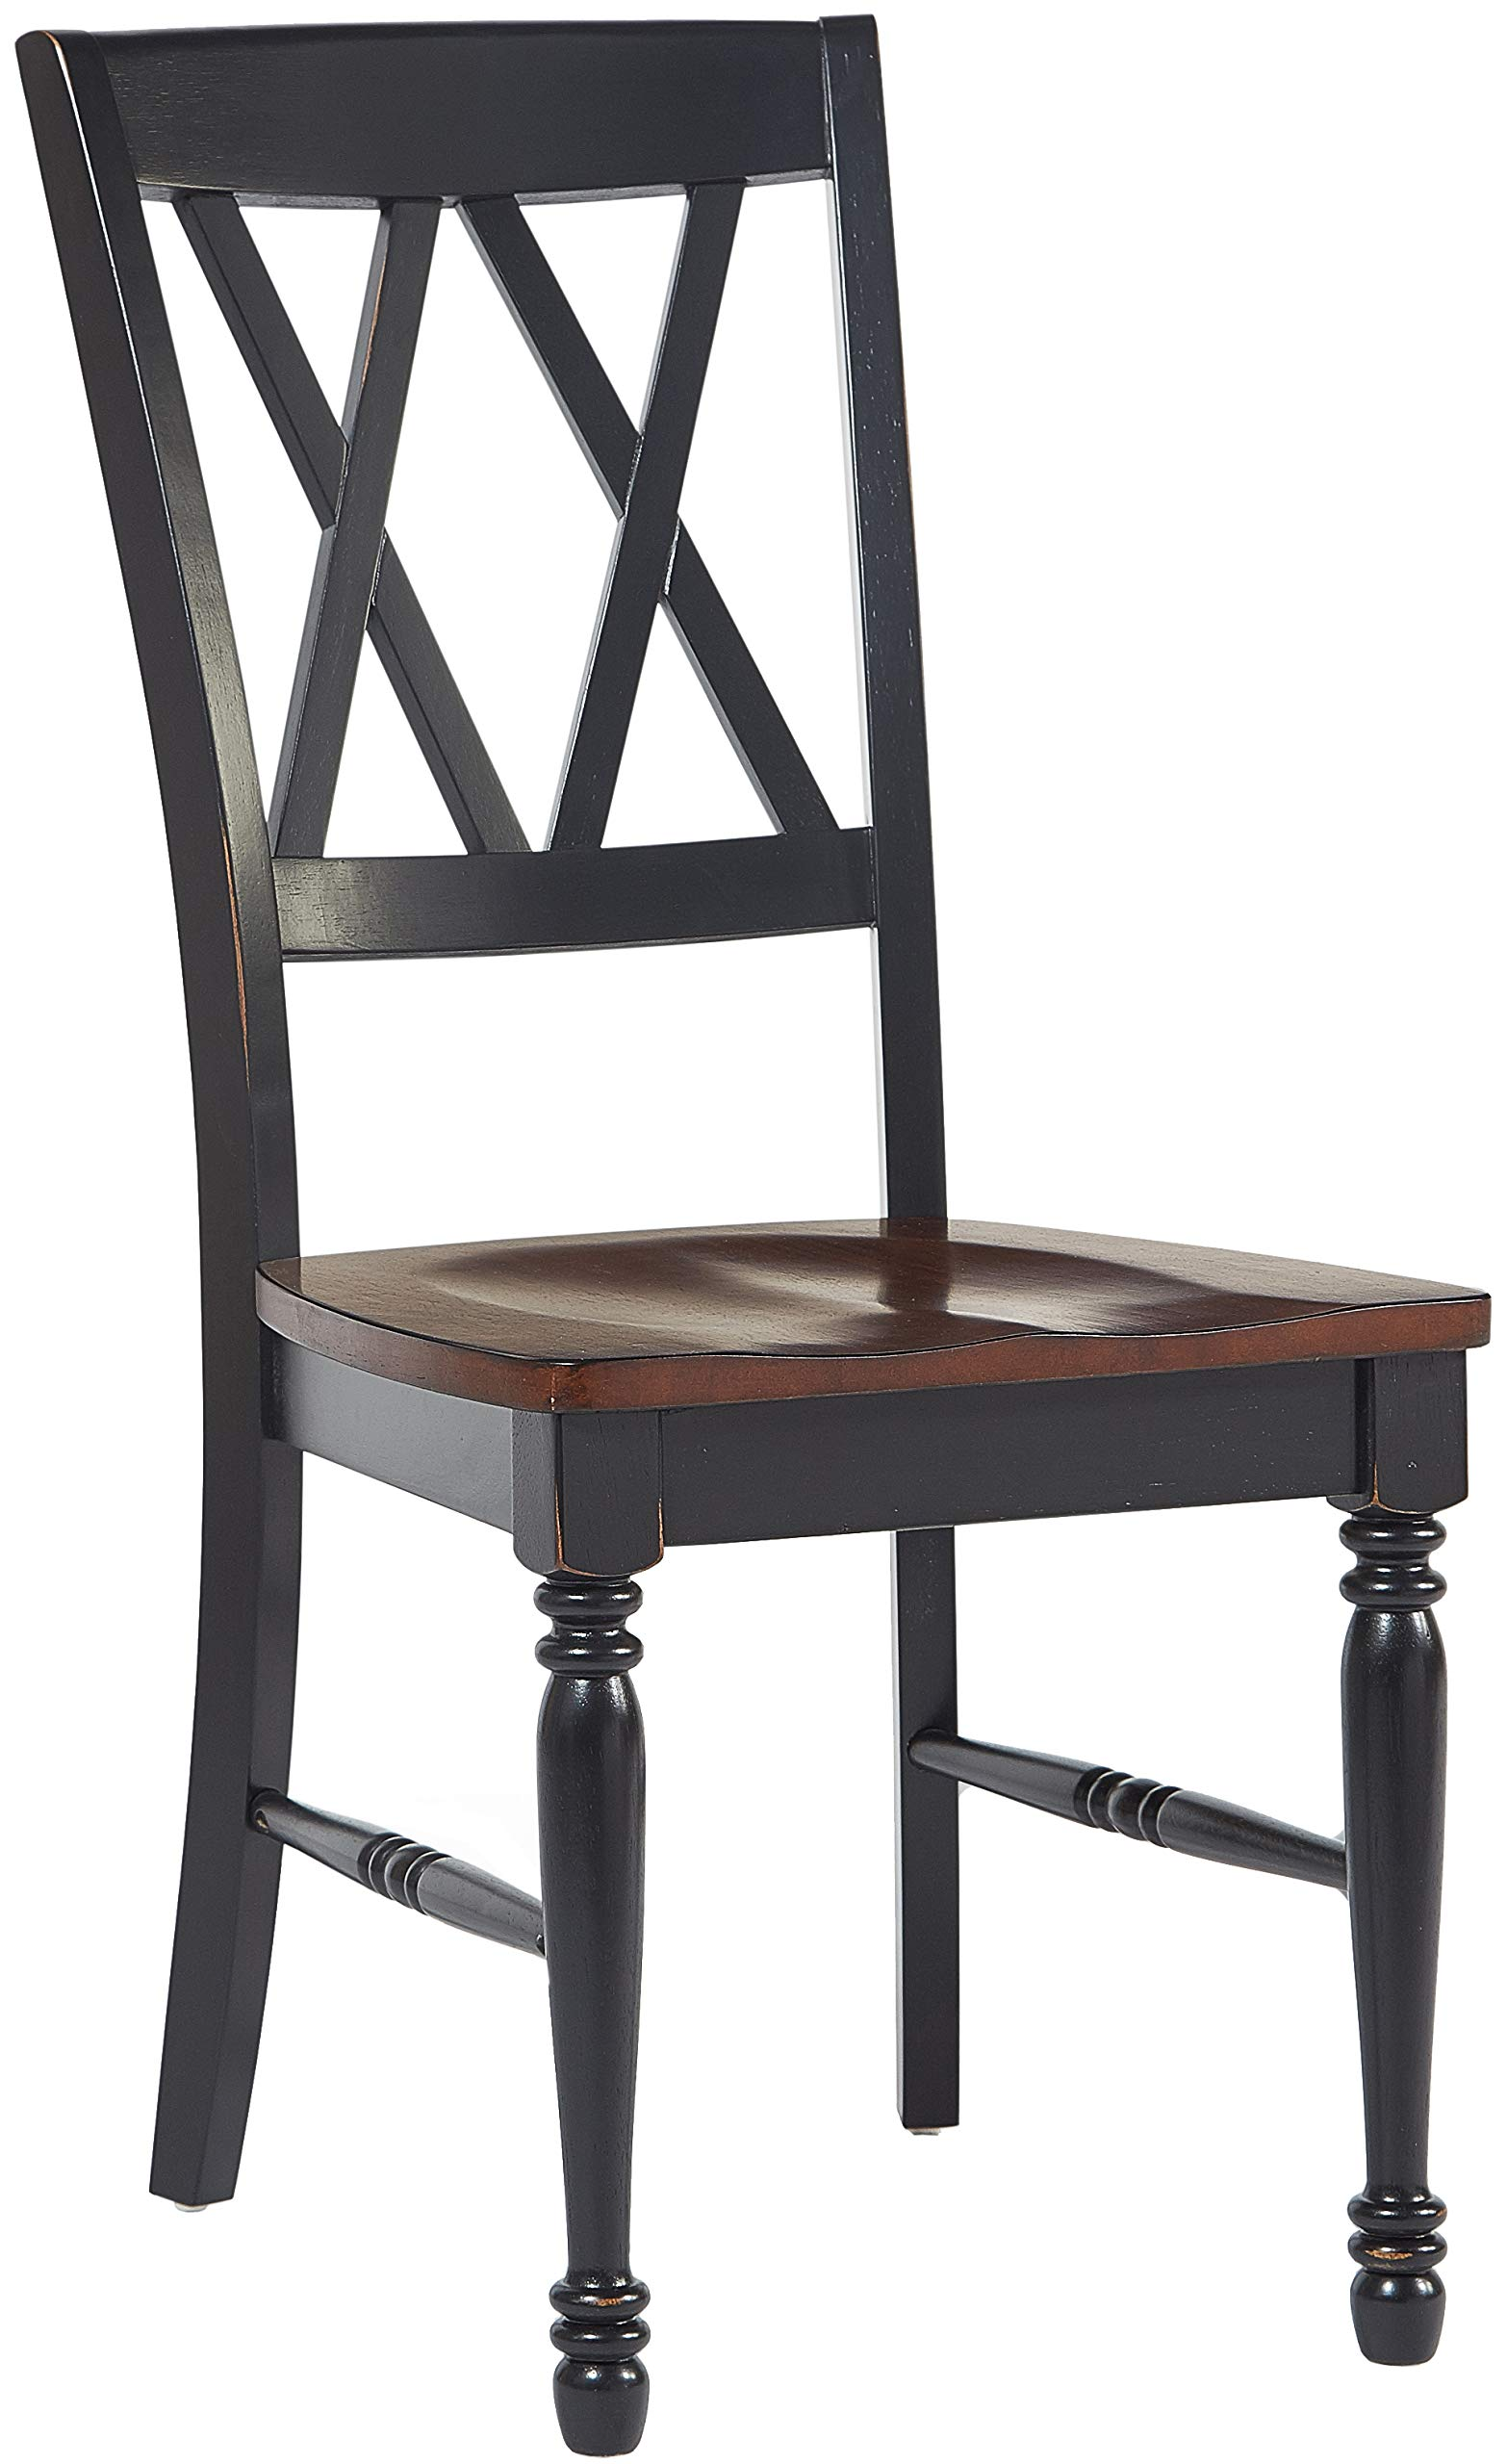 Crosley Furniture KF20001-BK Shelby 7-Piece Dining Set, Black by Crosley Furniture (Image #4)